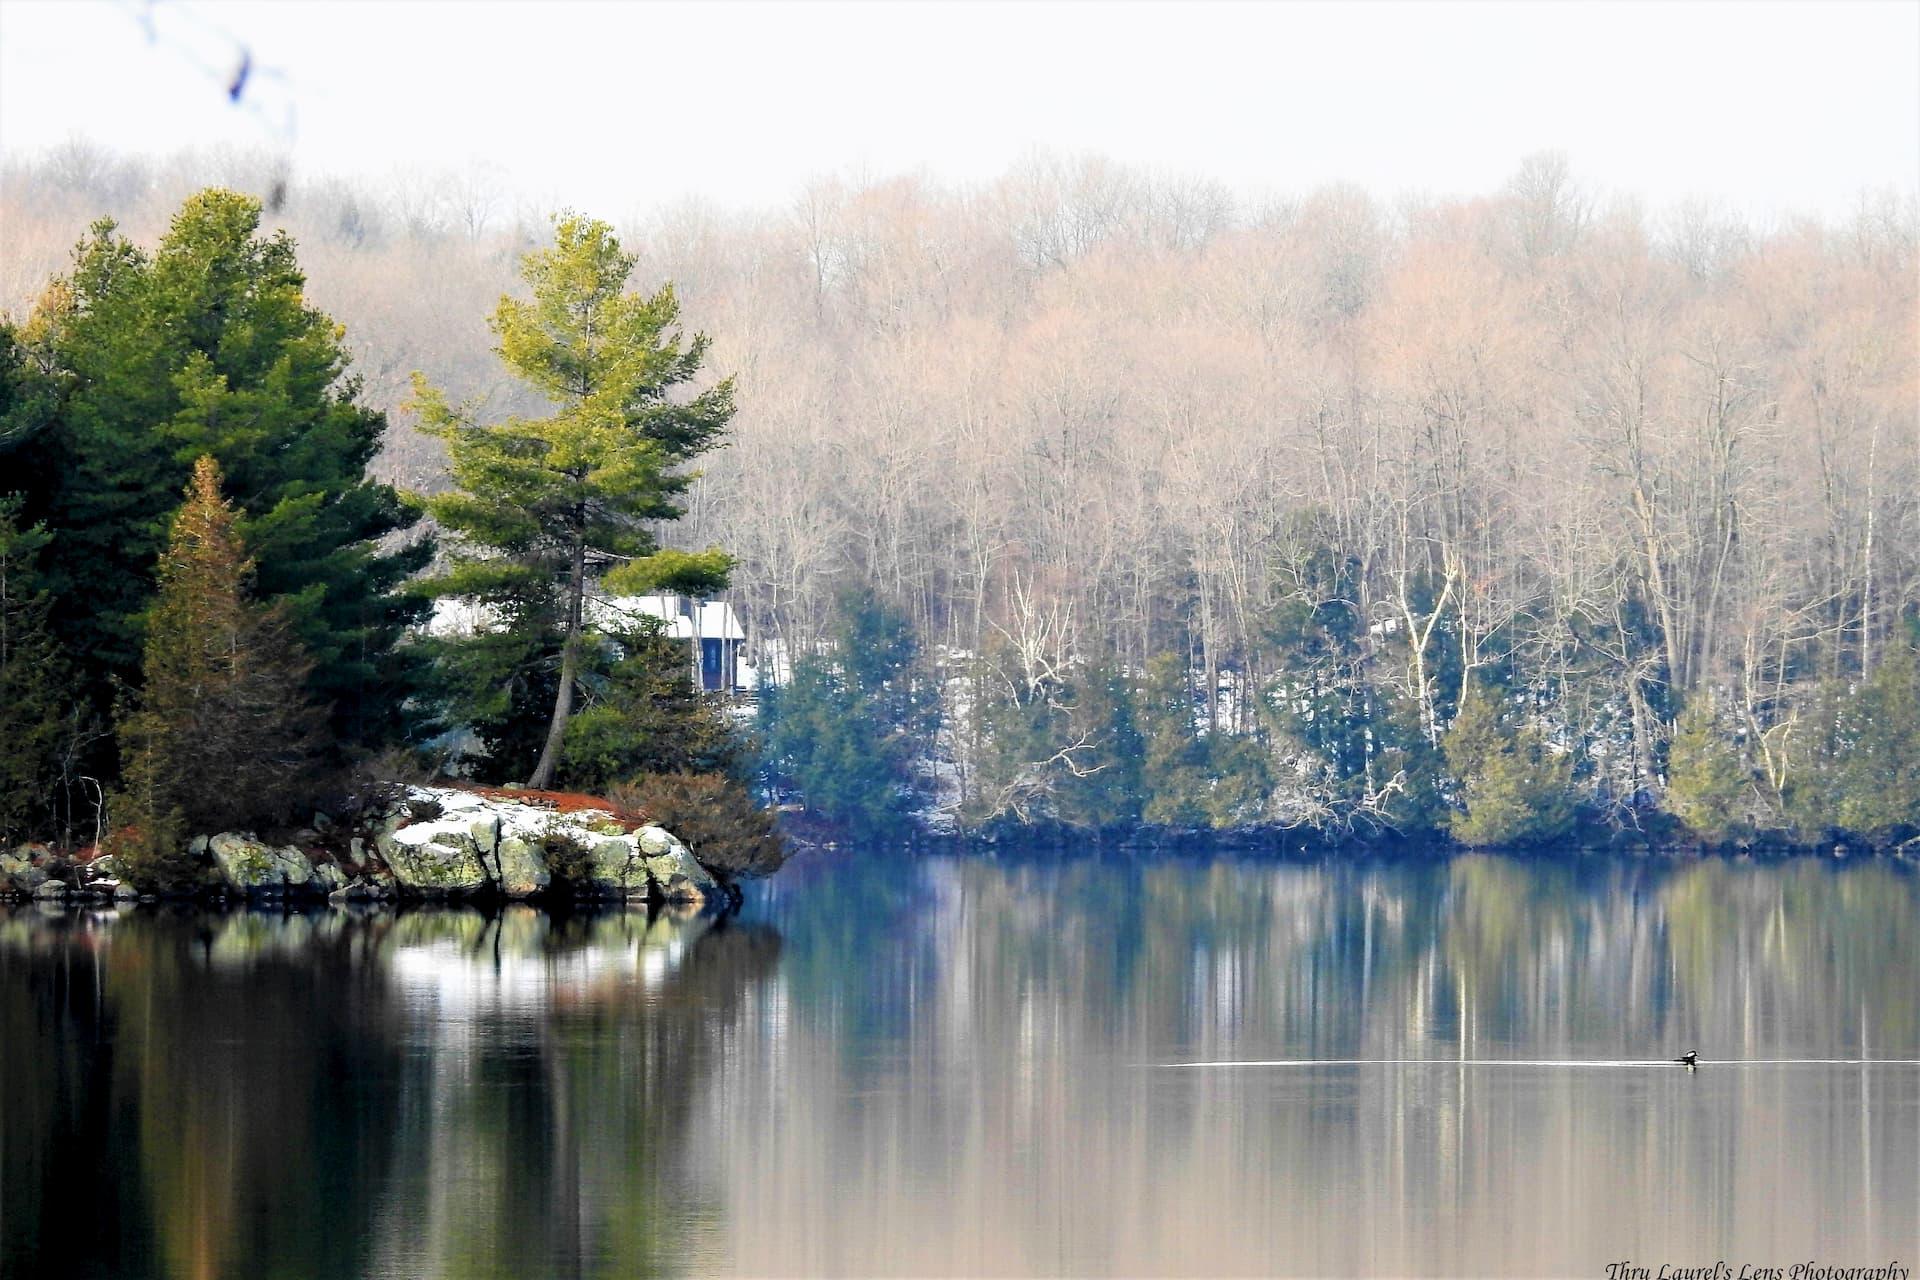 A lake side photo at Westport.